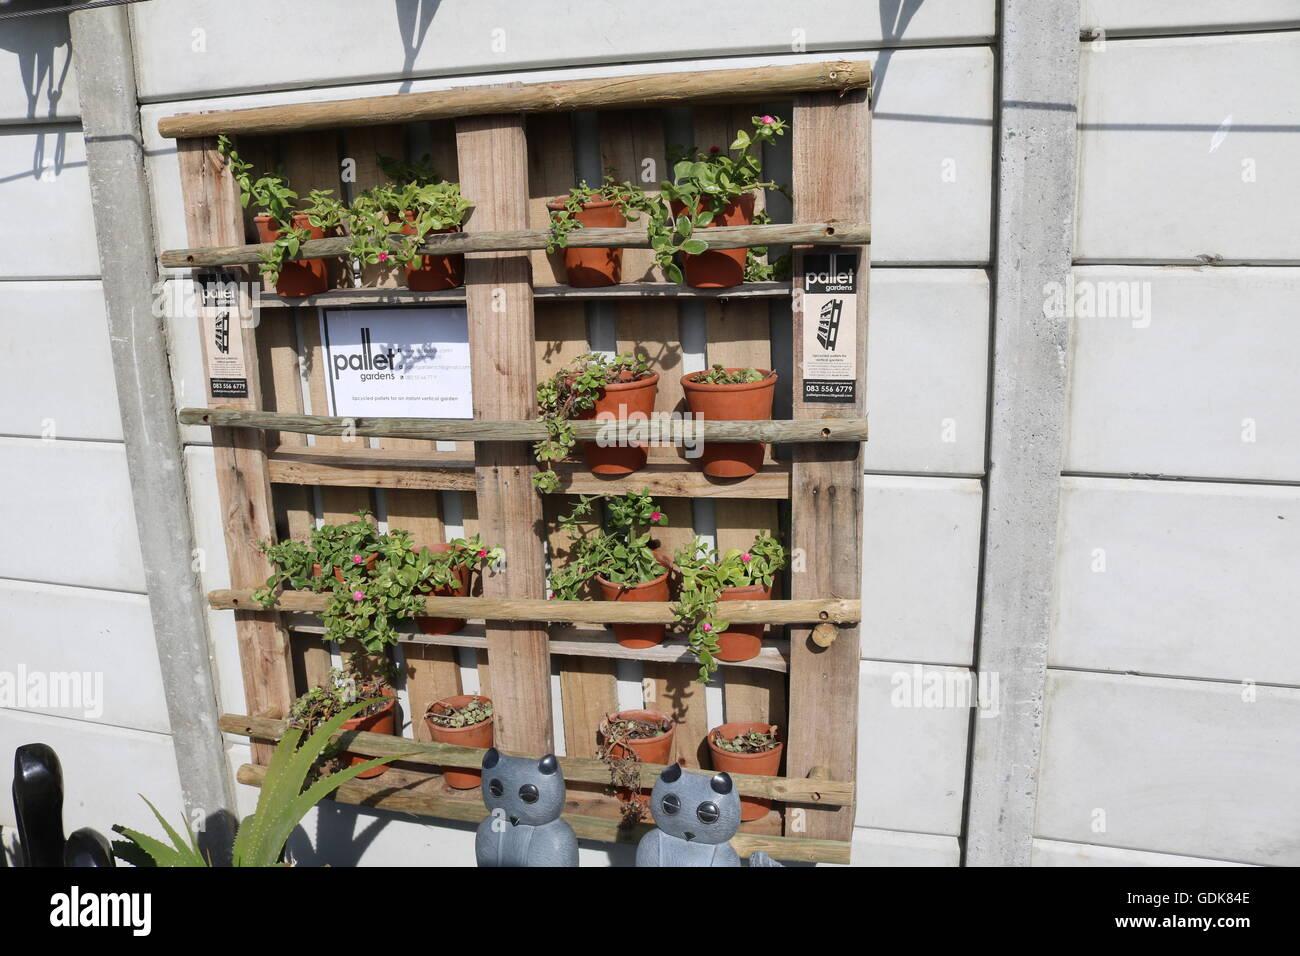 wooden pallet reused as pot plant holder - Stock Image